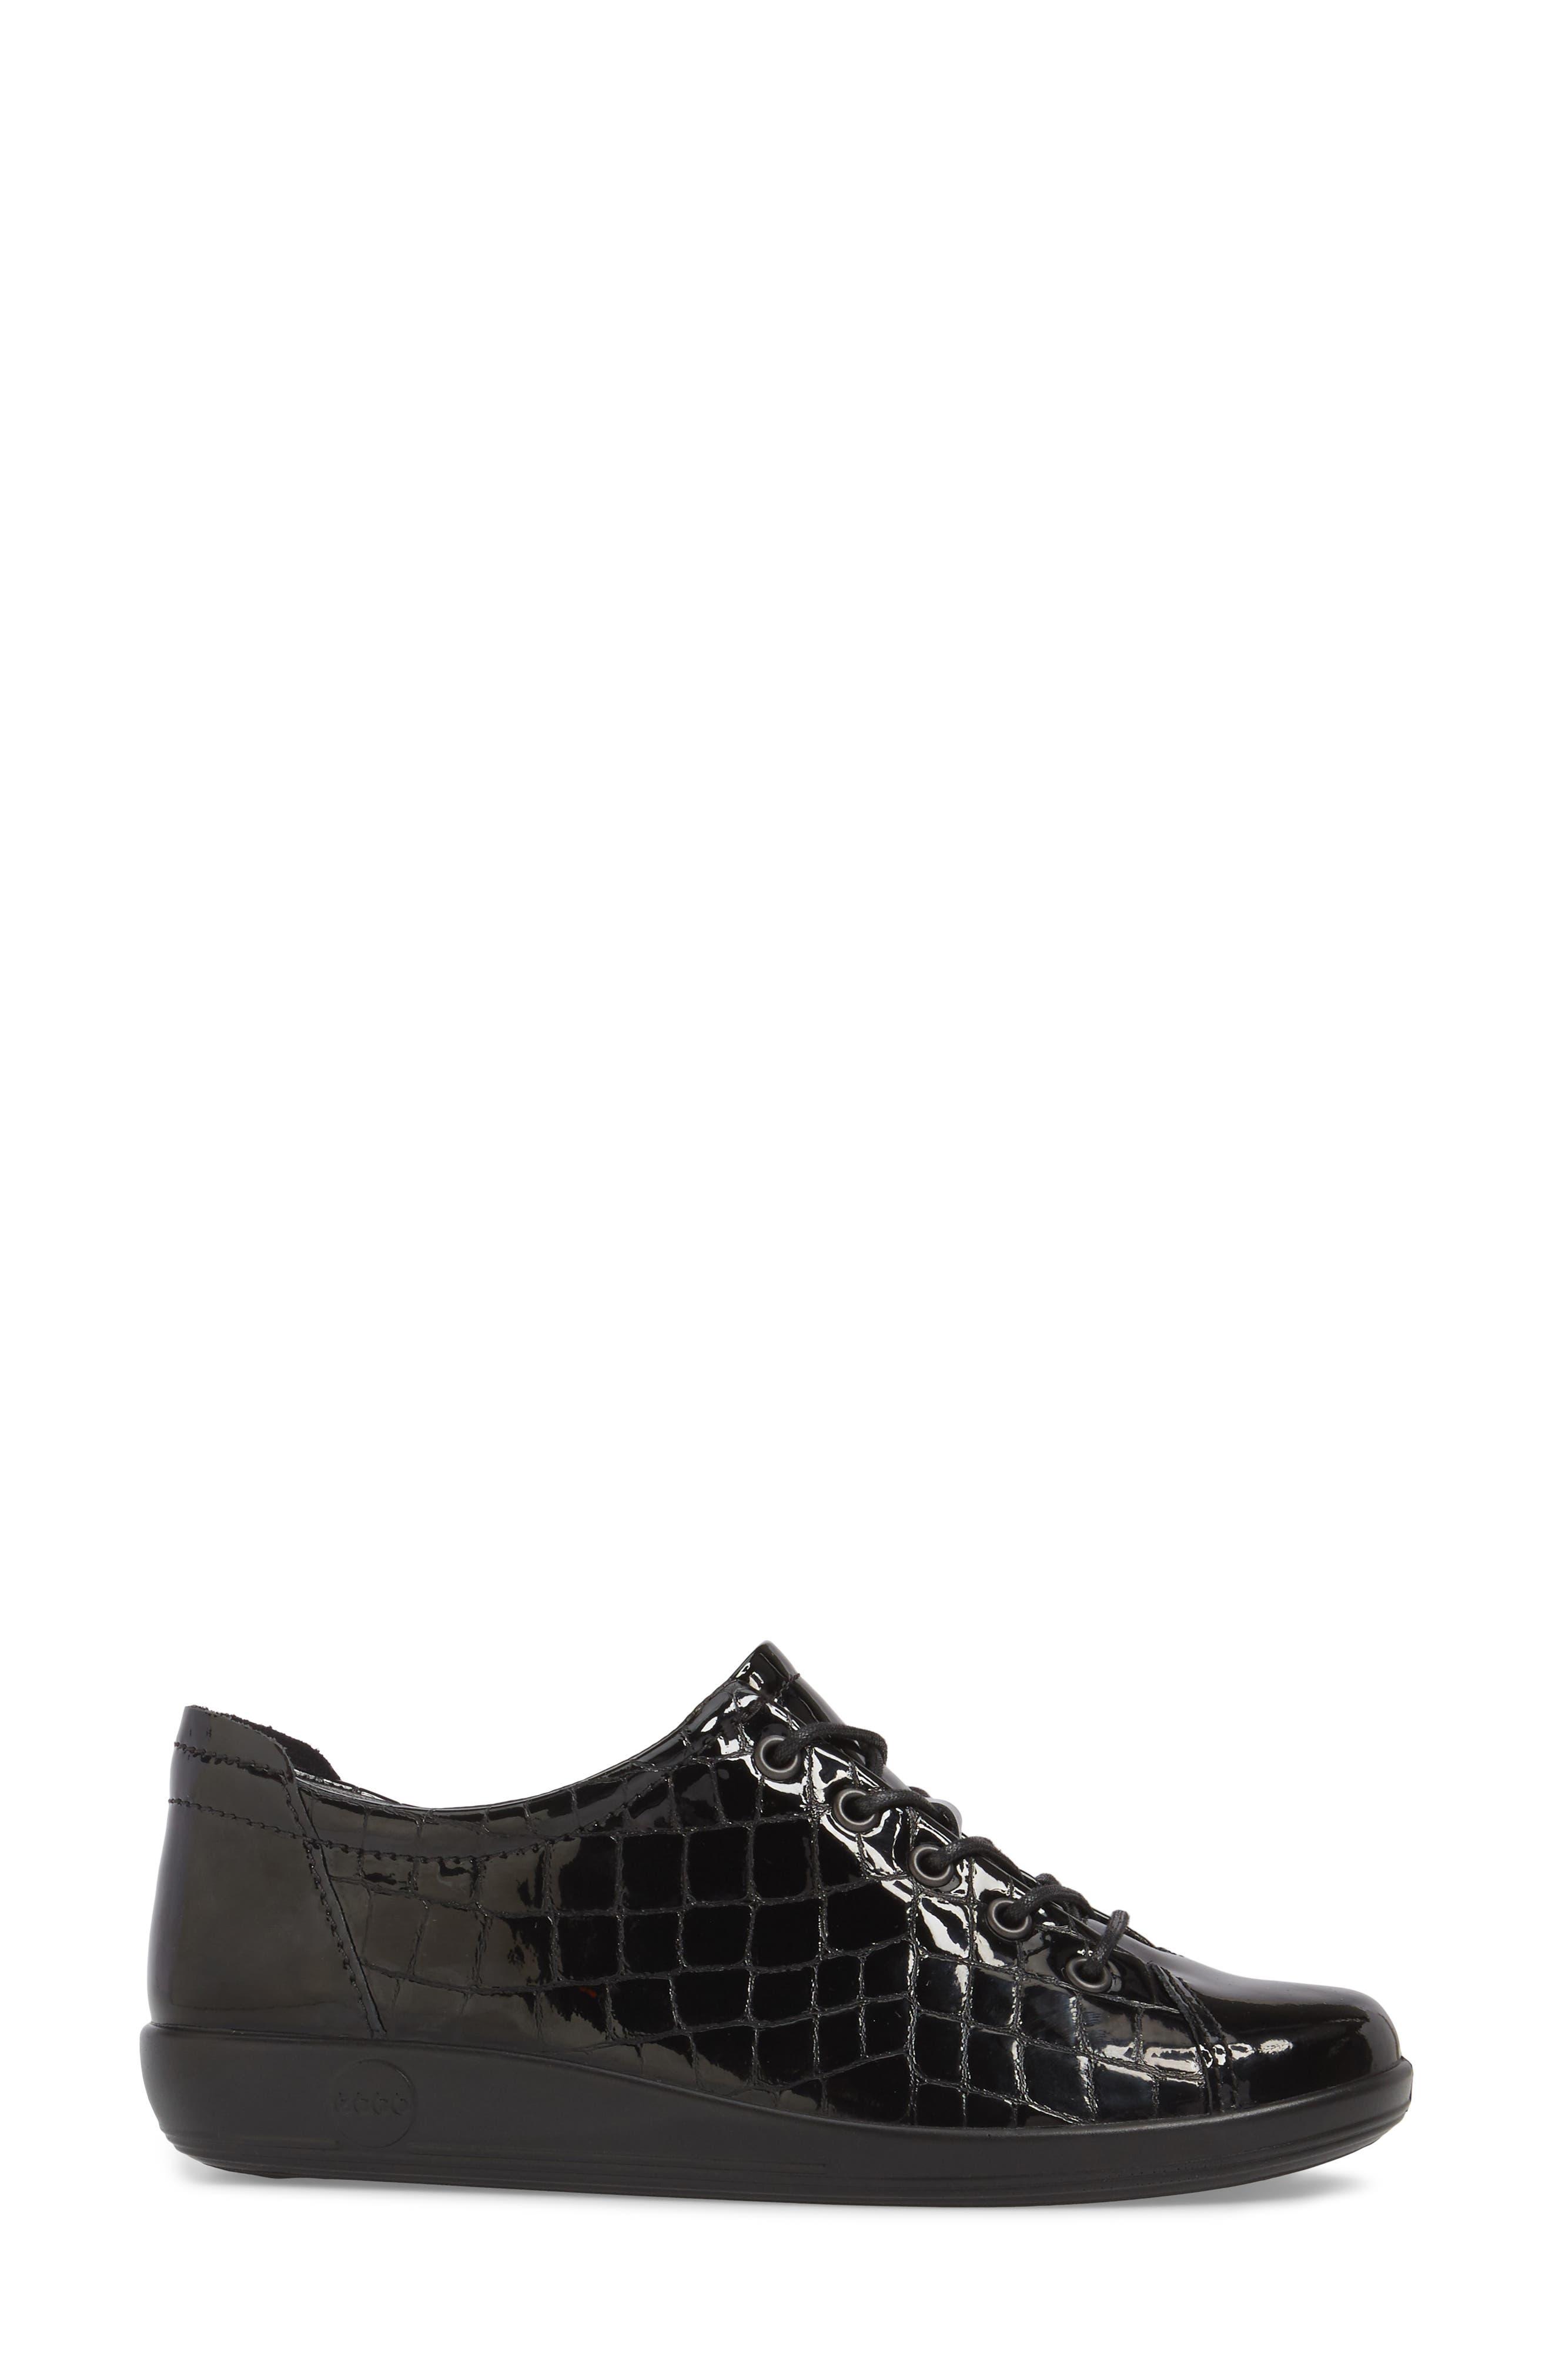 Alternate Image 3  - ECCO 'Soft 2.0' Sneaker (Women)